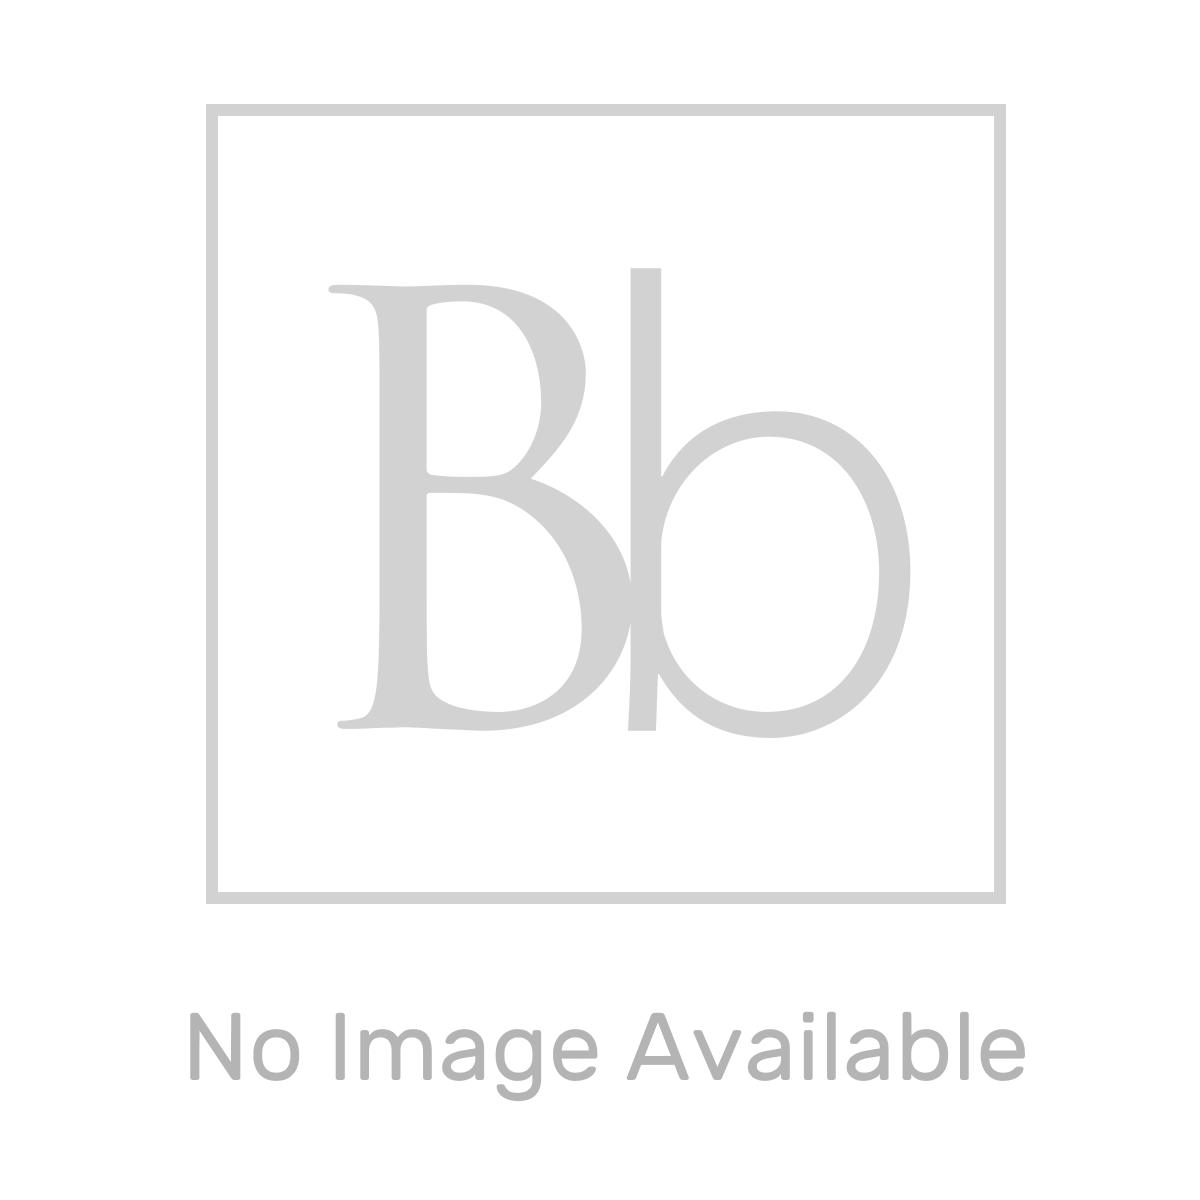 Merlyn Truestone Slate Black Square Shower Tray 900 x 900mm